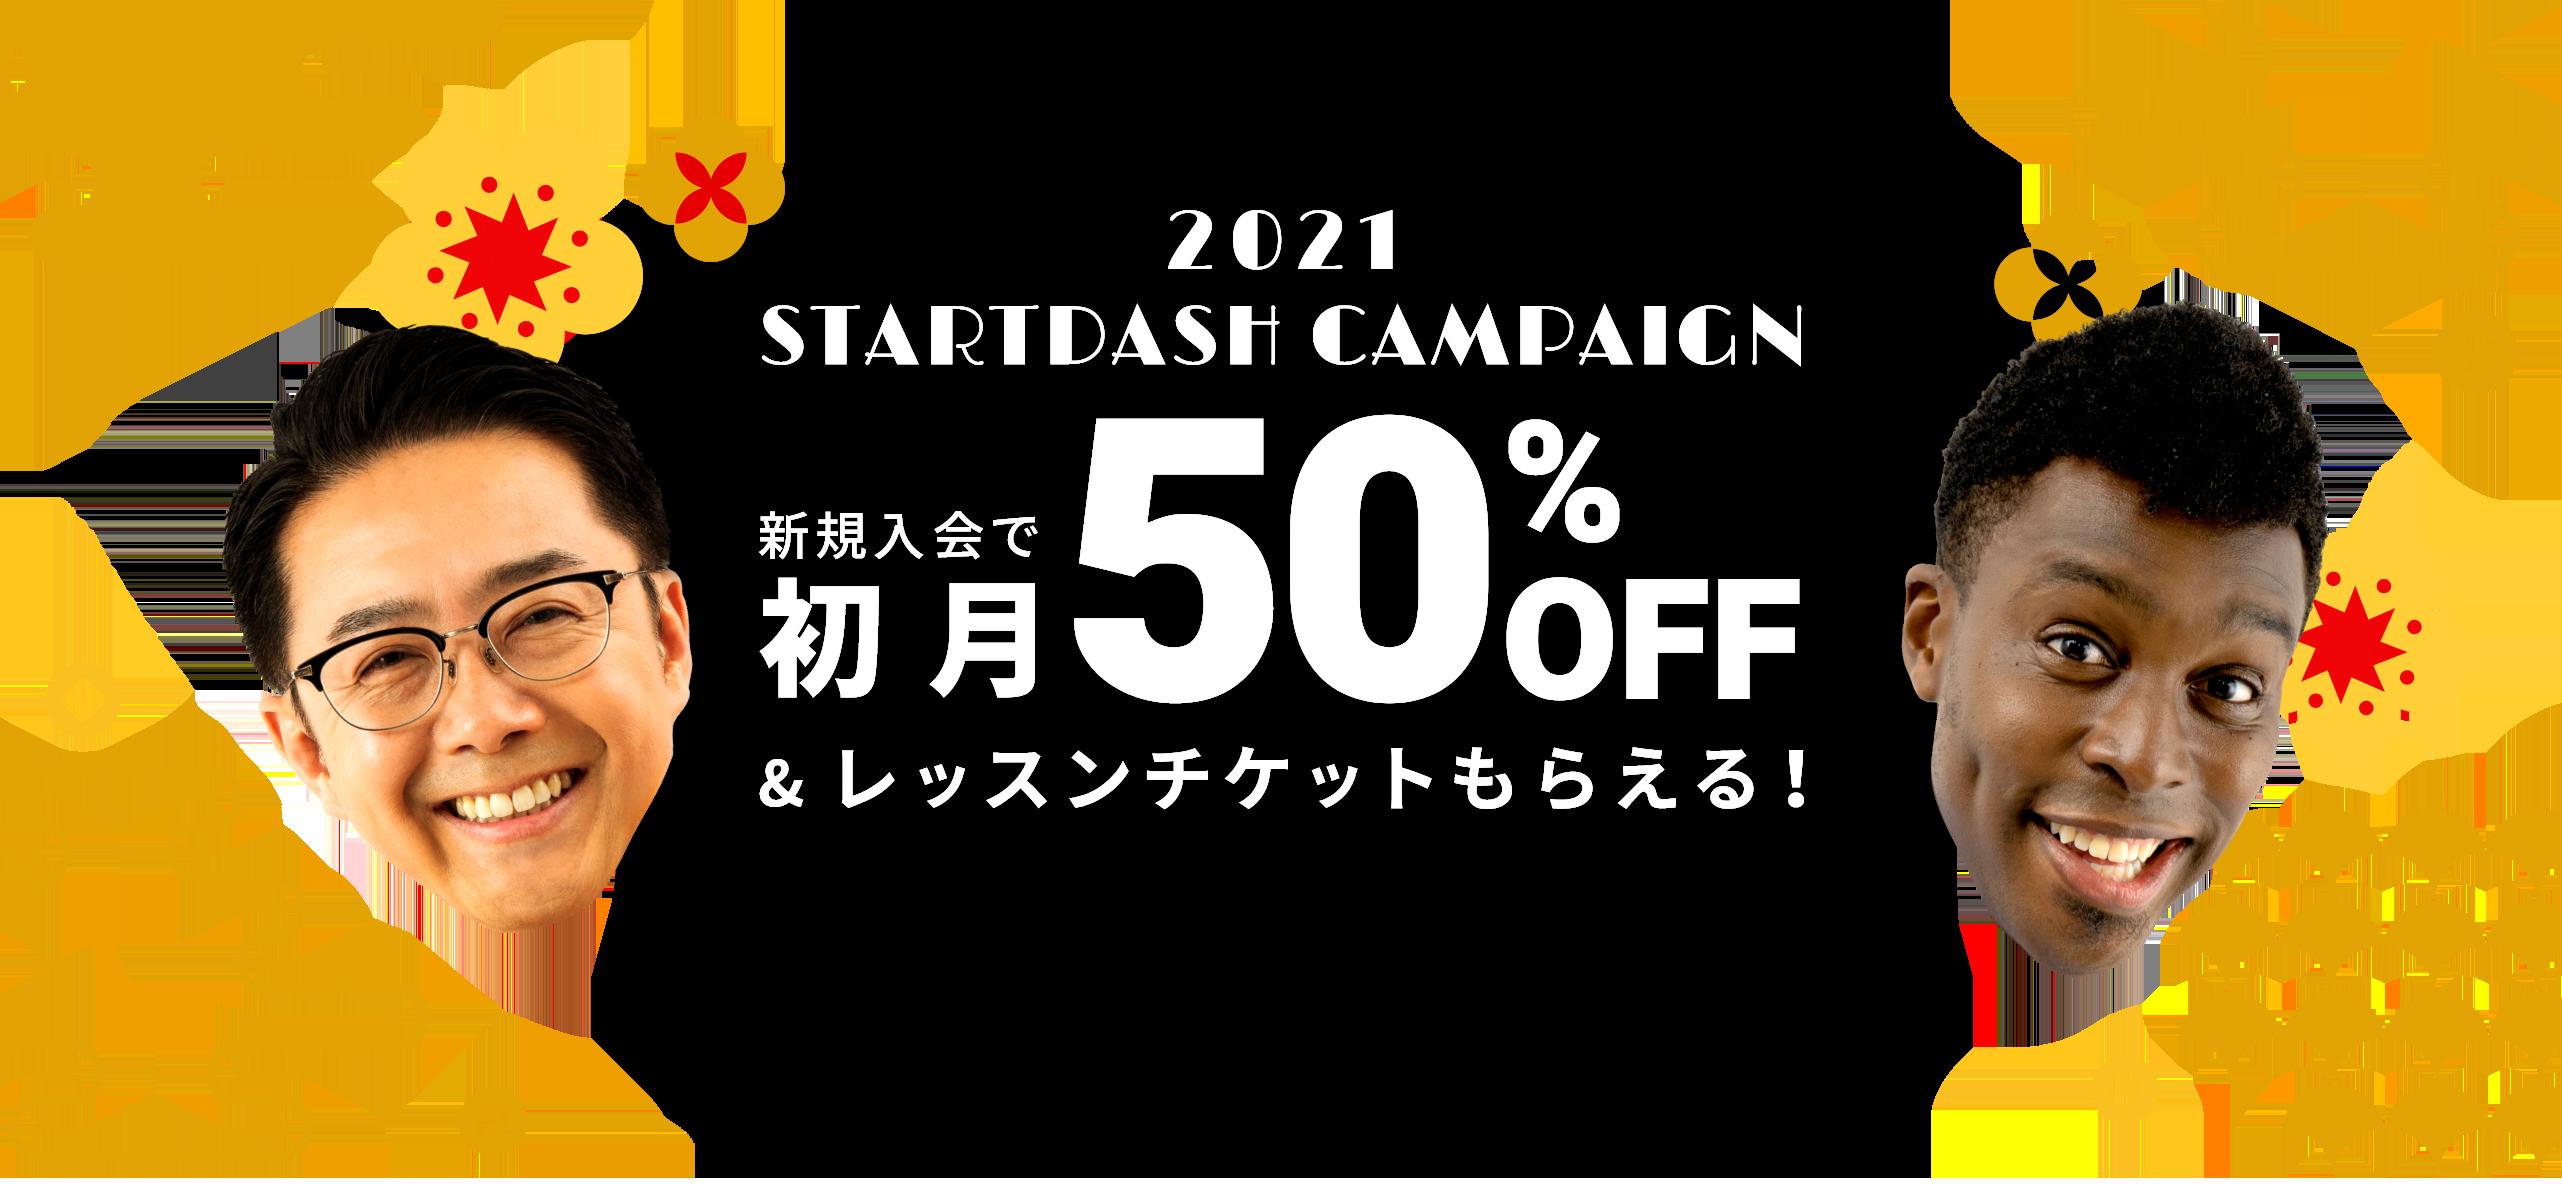 startdash campaign 2021